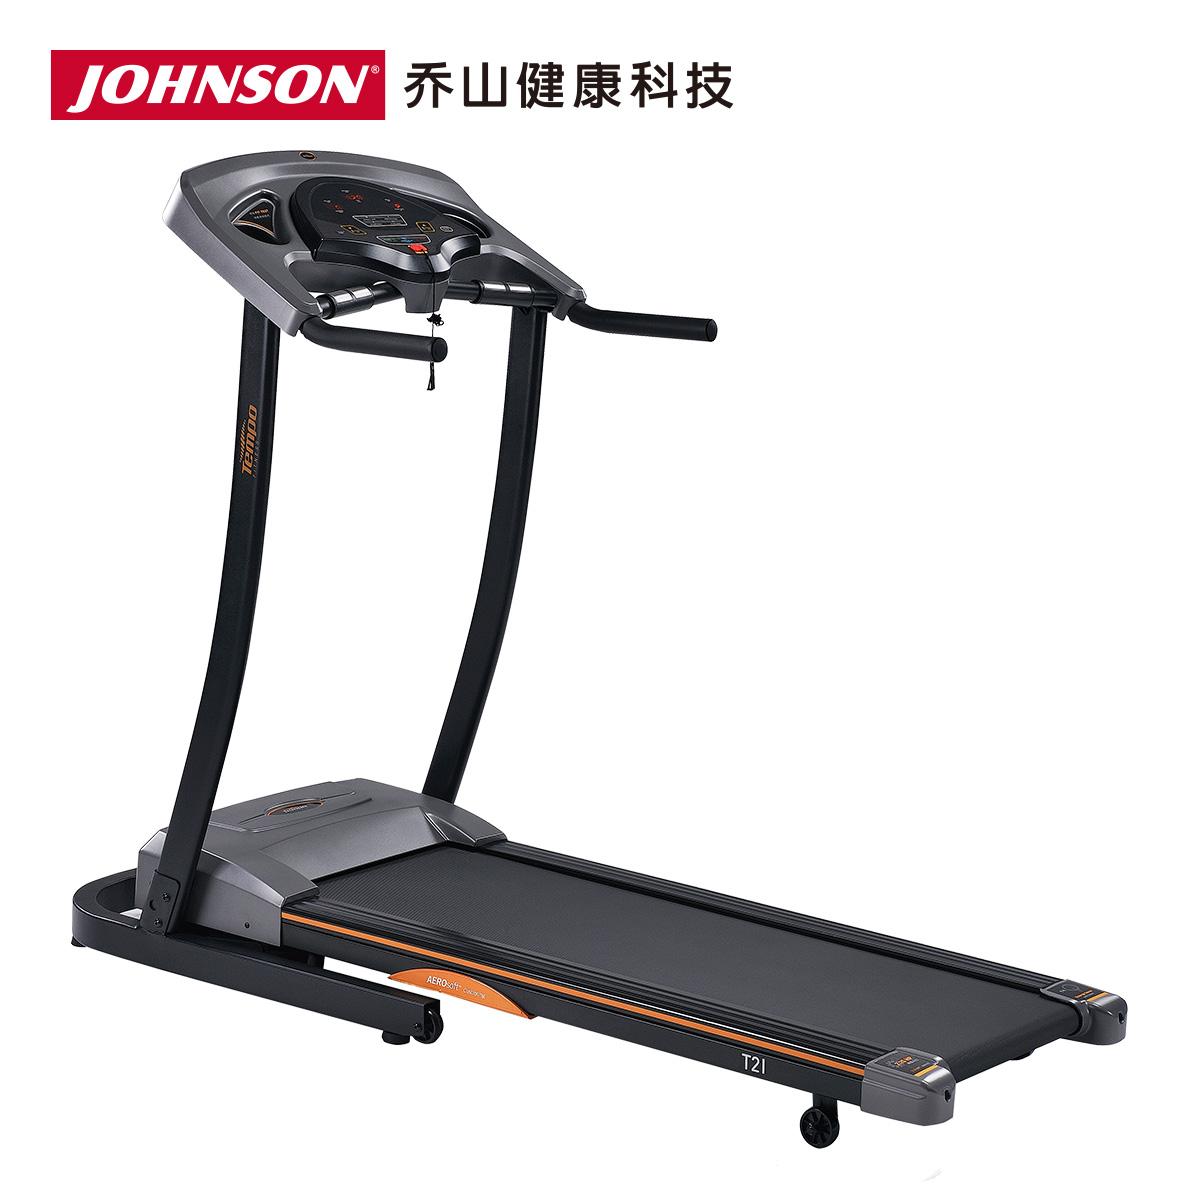 small running machine for home